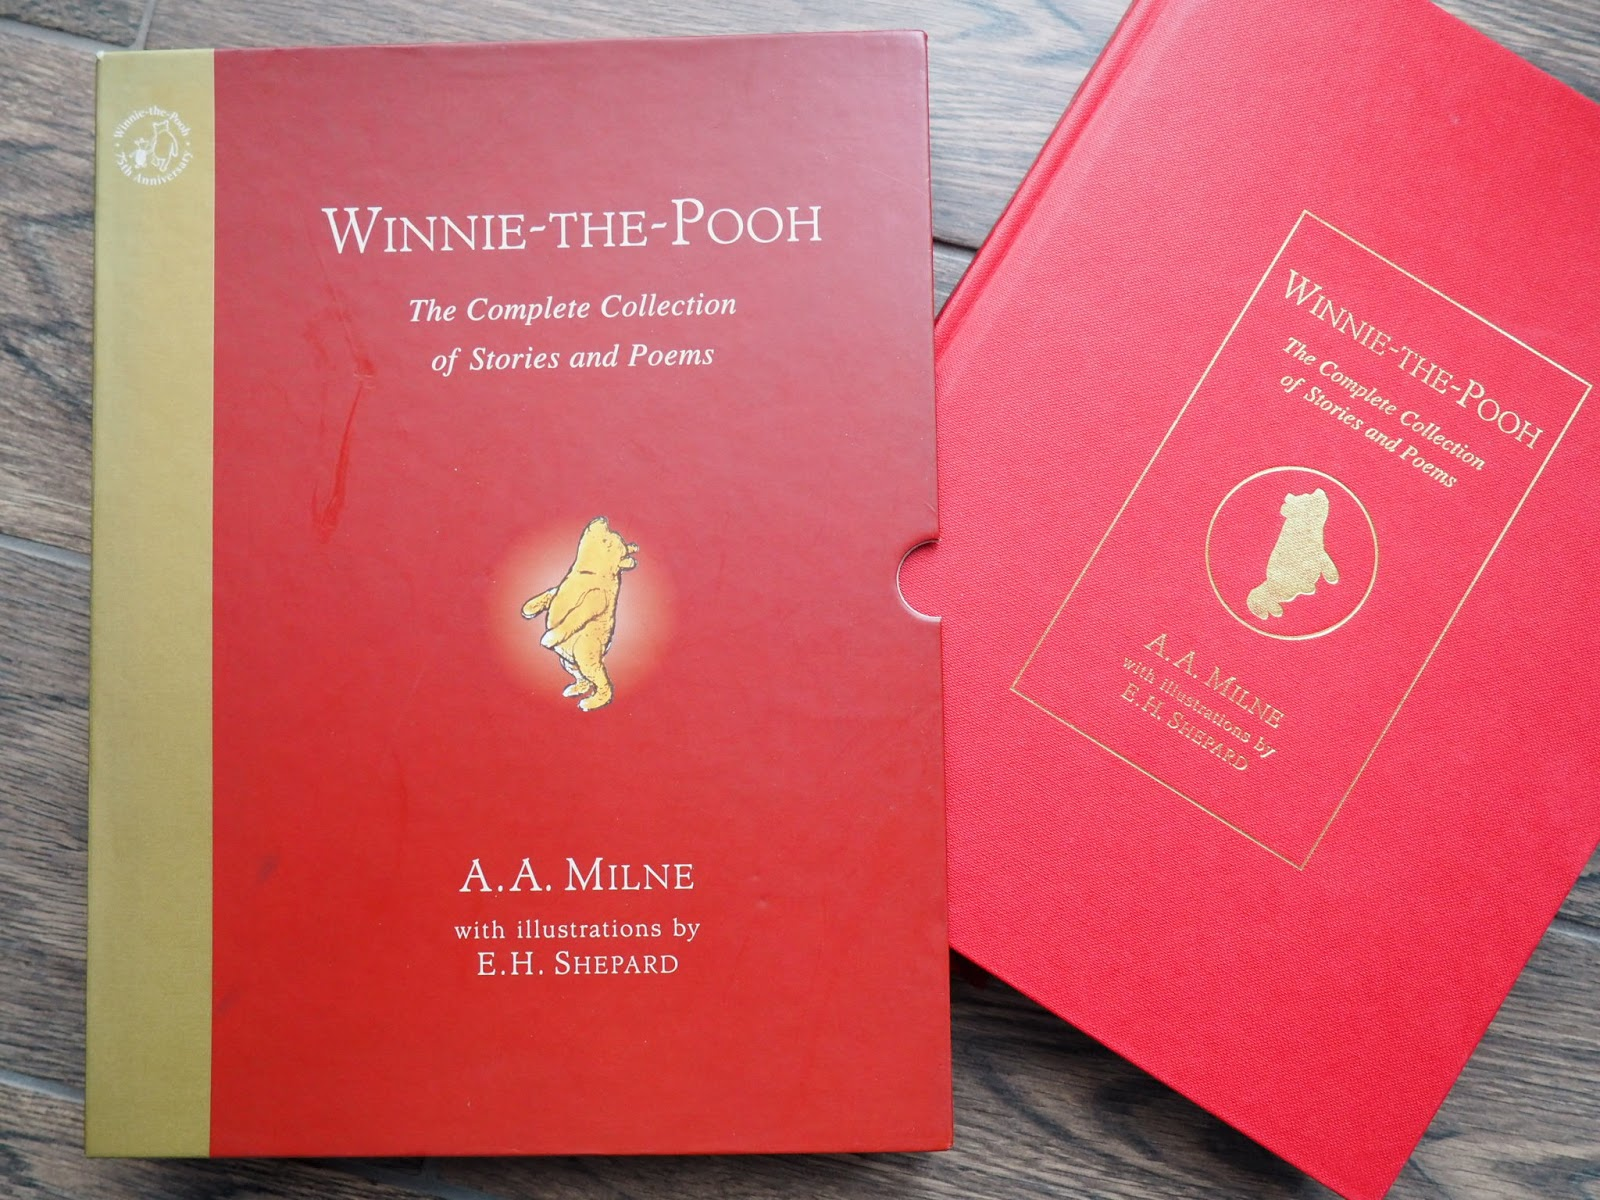 90th Anniversary - Winnie-the-Pooh